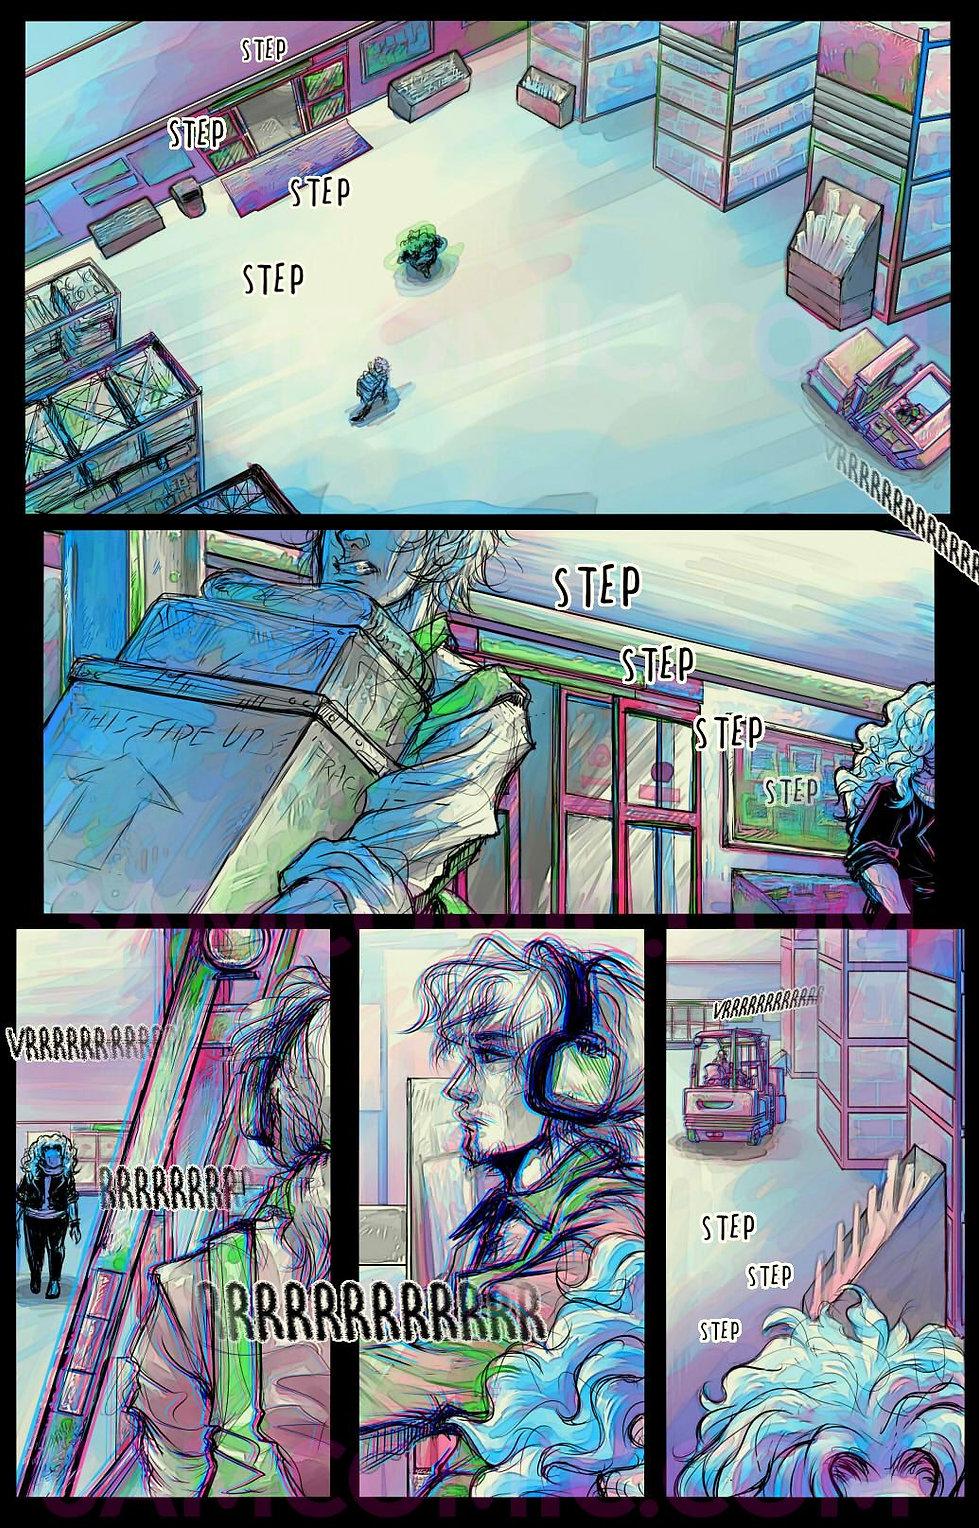 3AMComic | Chapter 01 Page 01